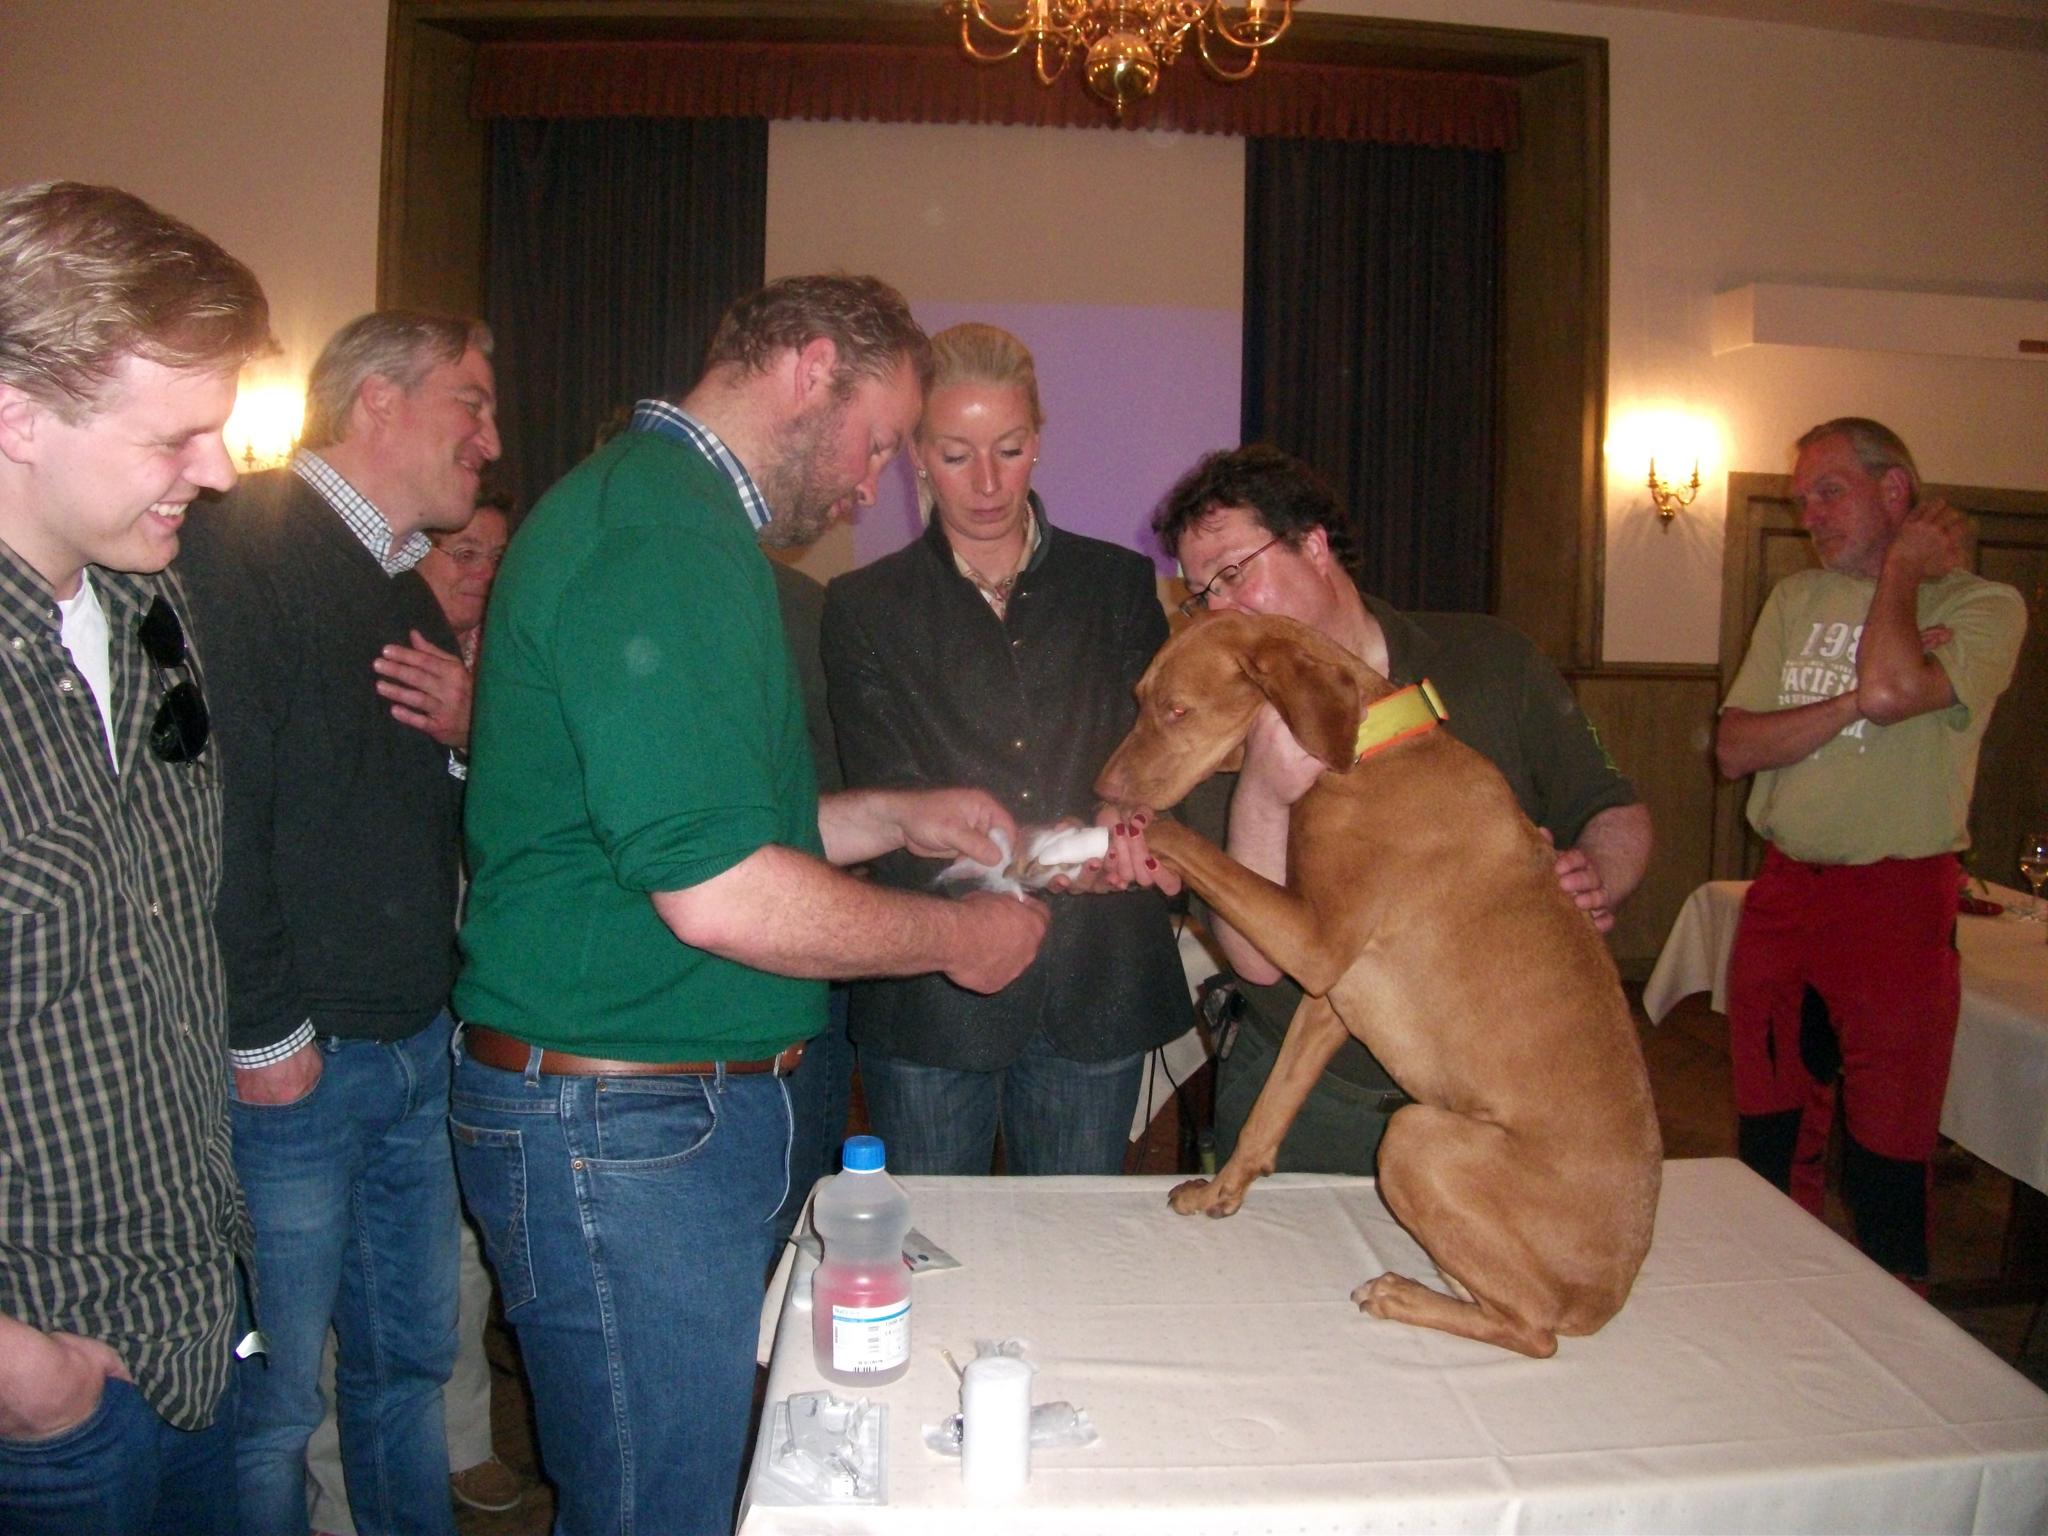 Jagdhund_Erste_Hilfe_Seminar_270615_004